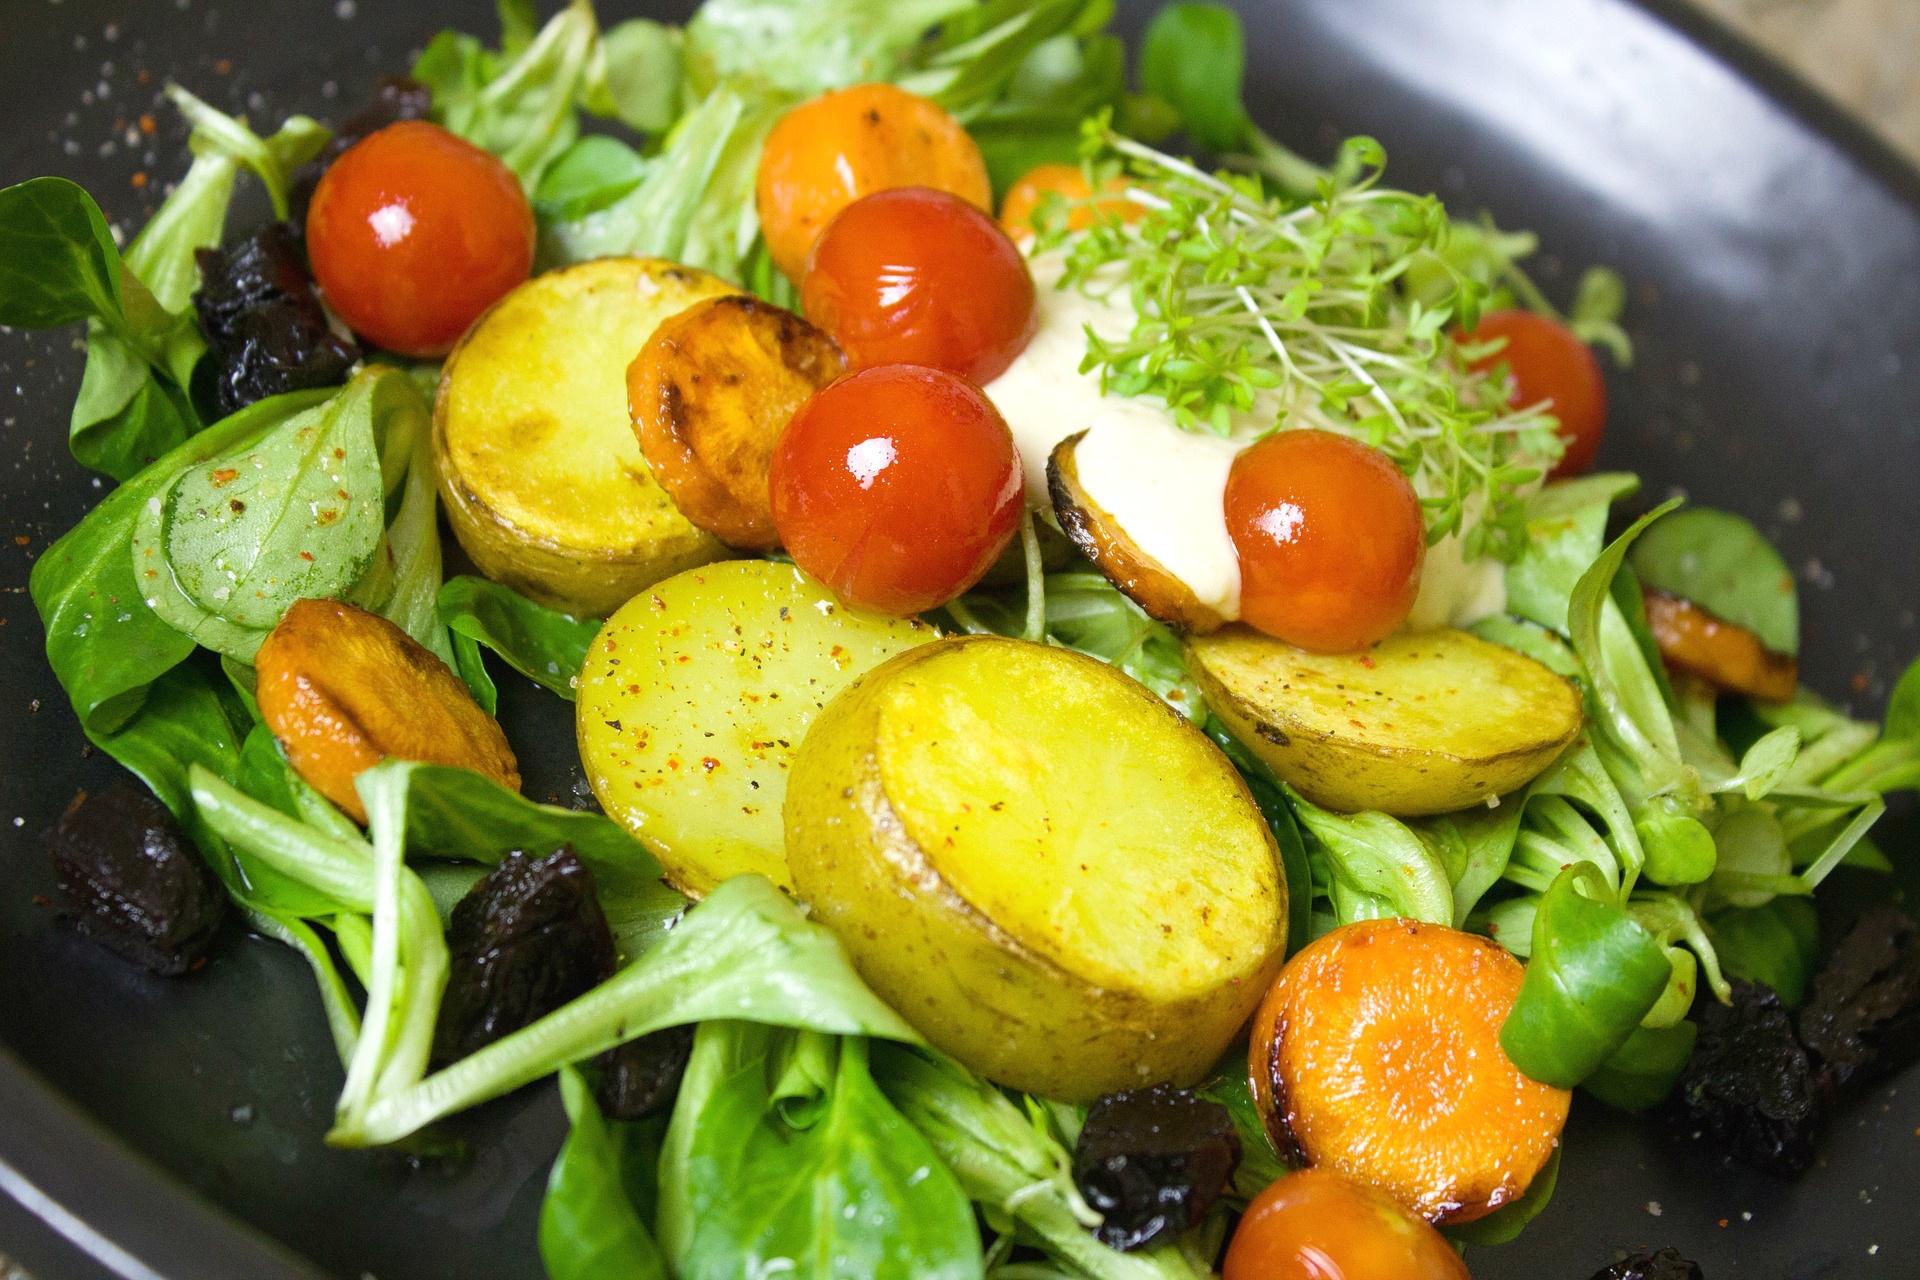 Ensalada con patatas asadas, zanahorias y ciruelas pasas - receta